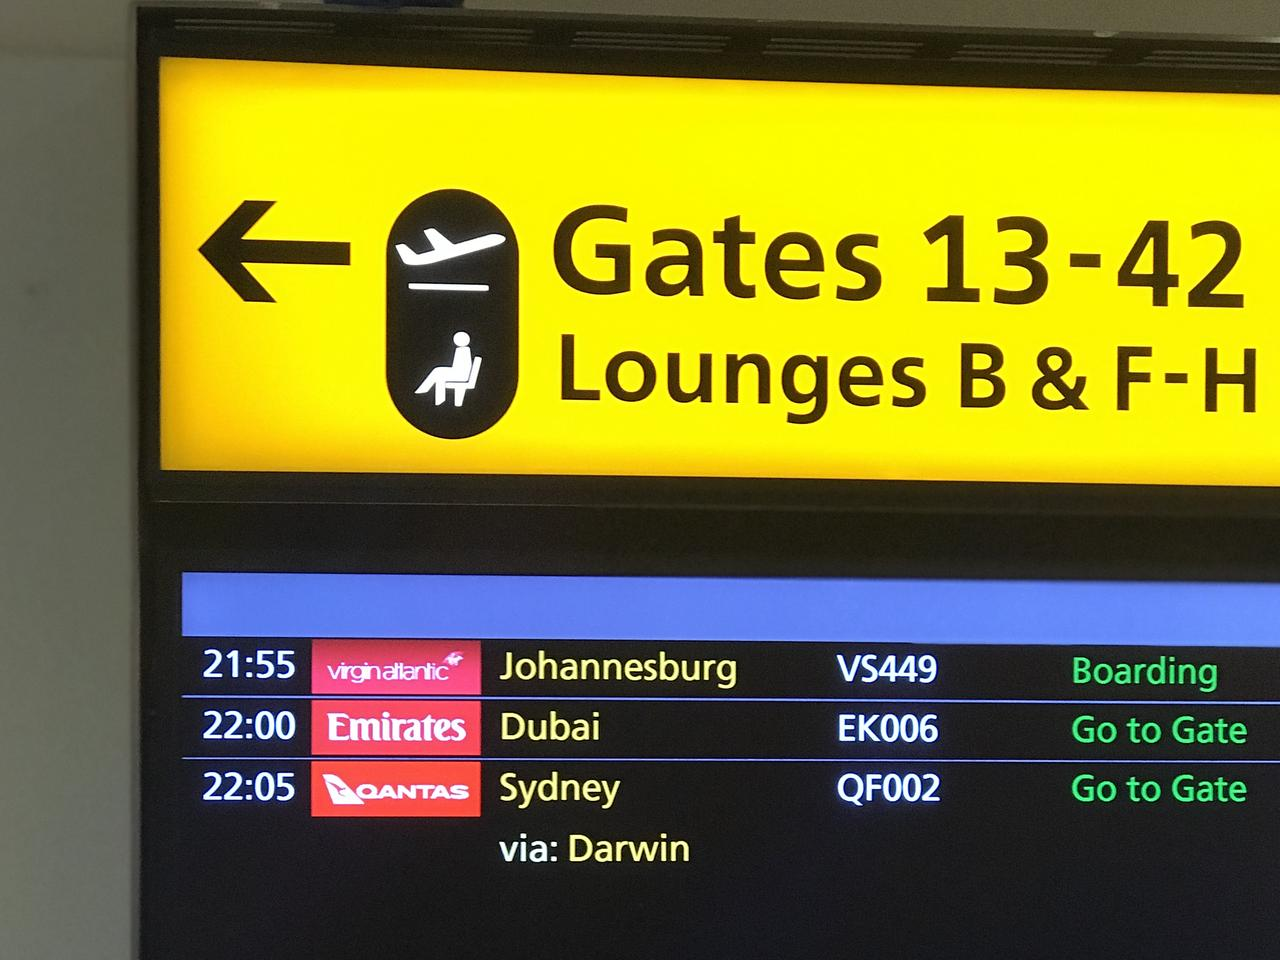 Hannah's flight went via Darwin.